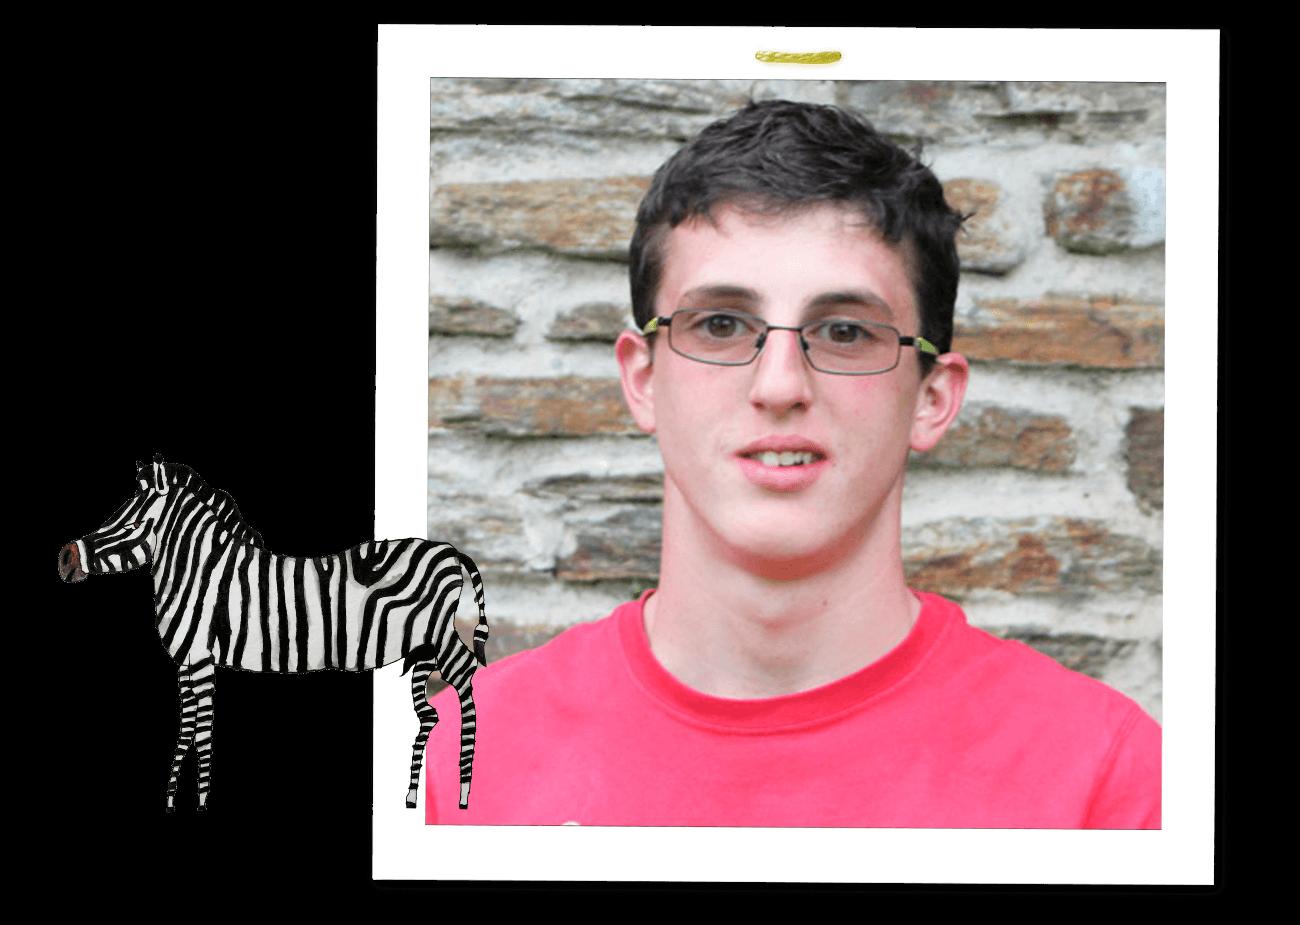 Albert Masser Portrait mit Zebra